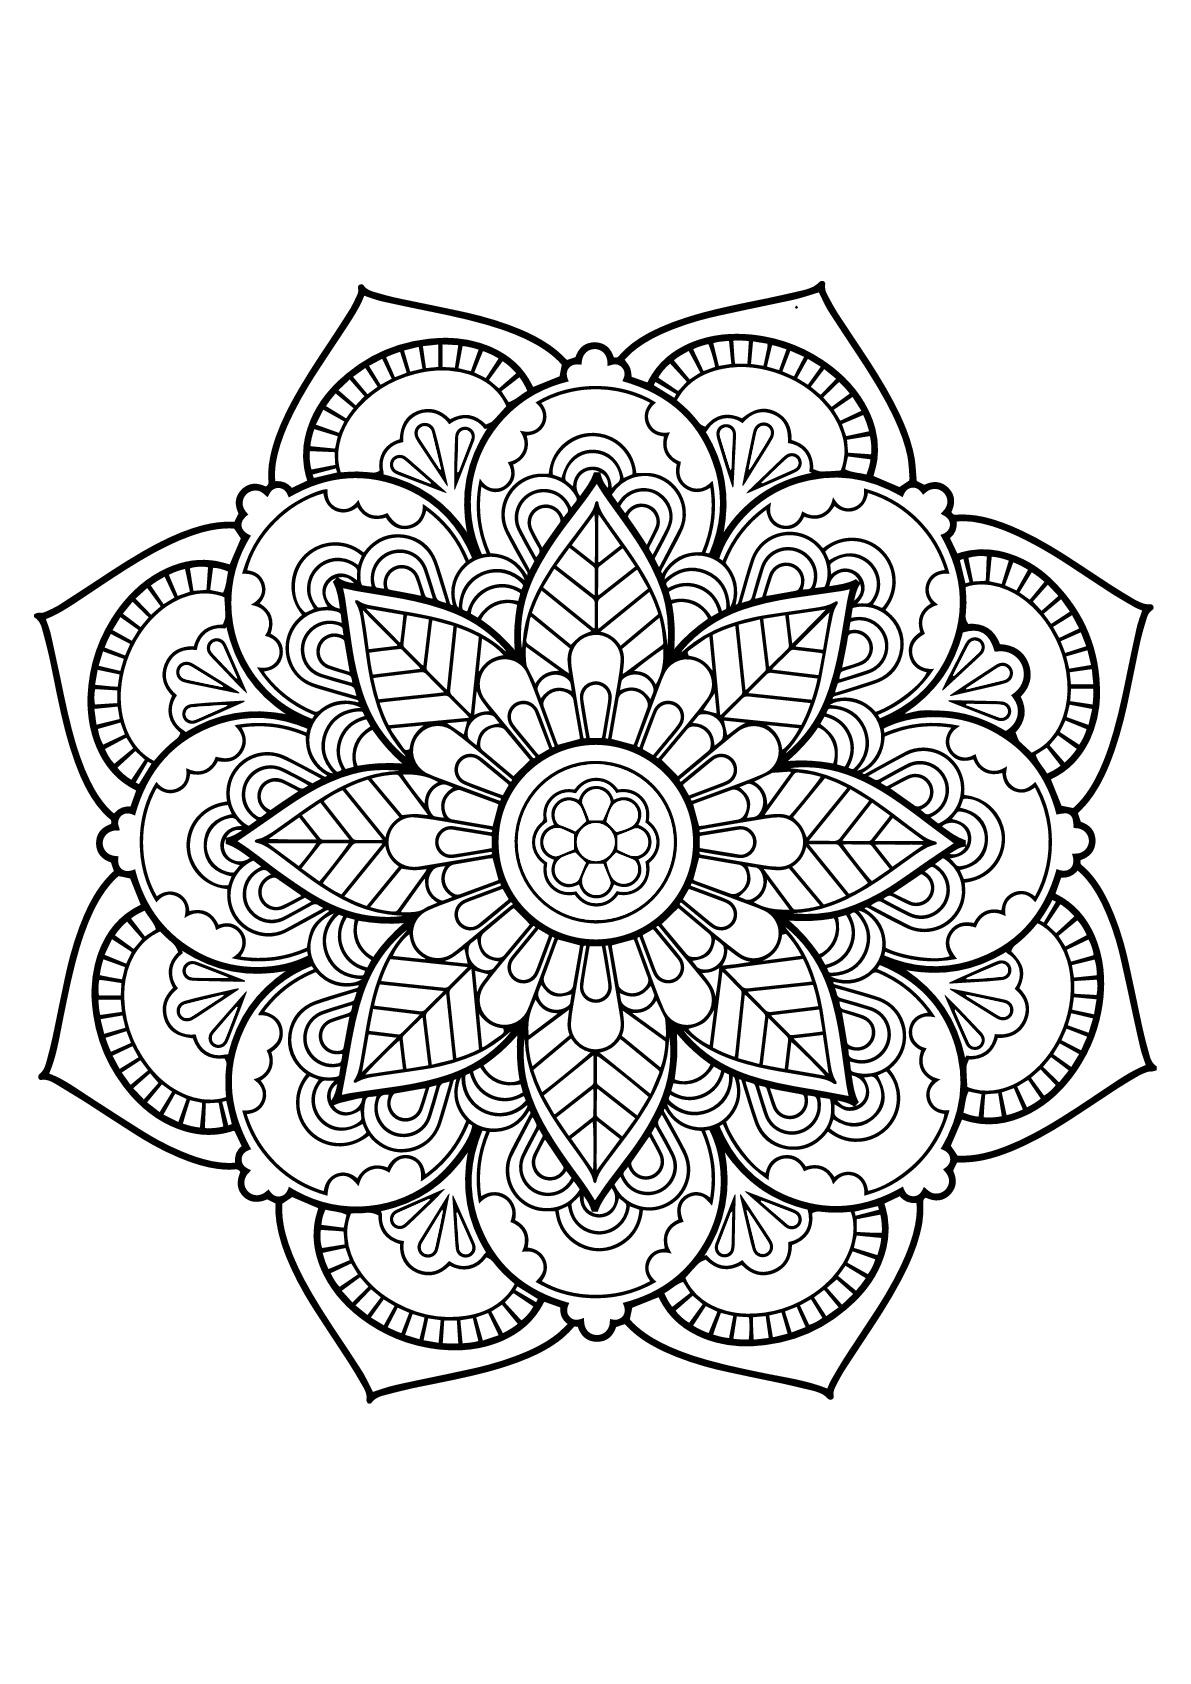 Mandala complexe livre gratuit 22 coloriage mandalas - Coloriage mandala enfants ...